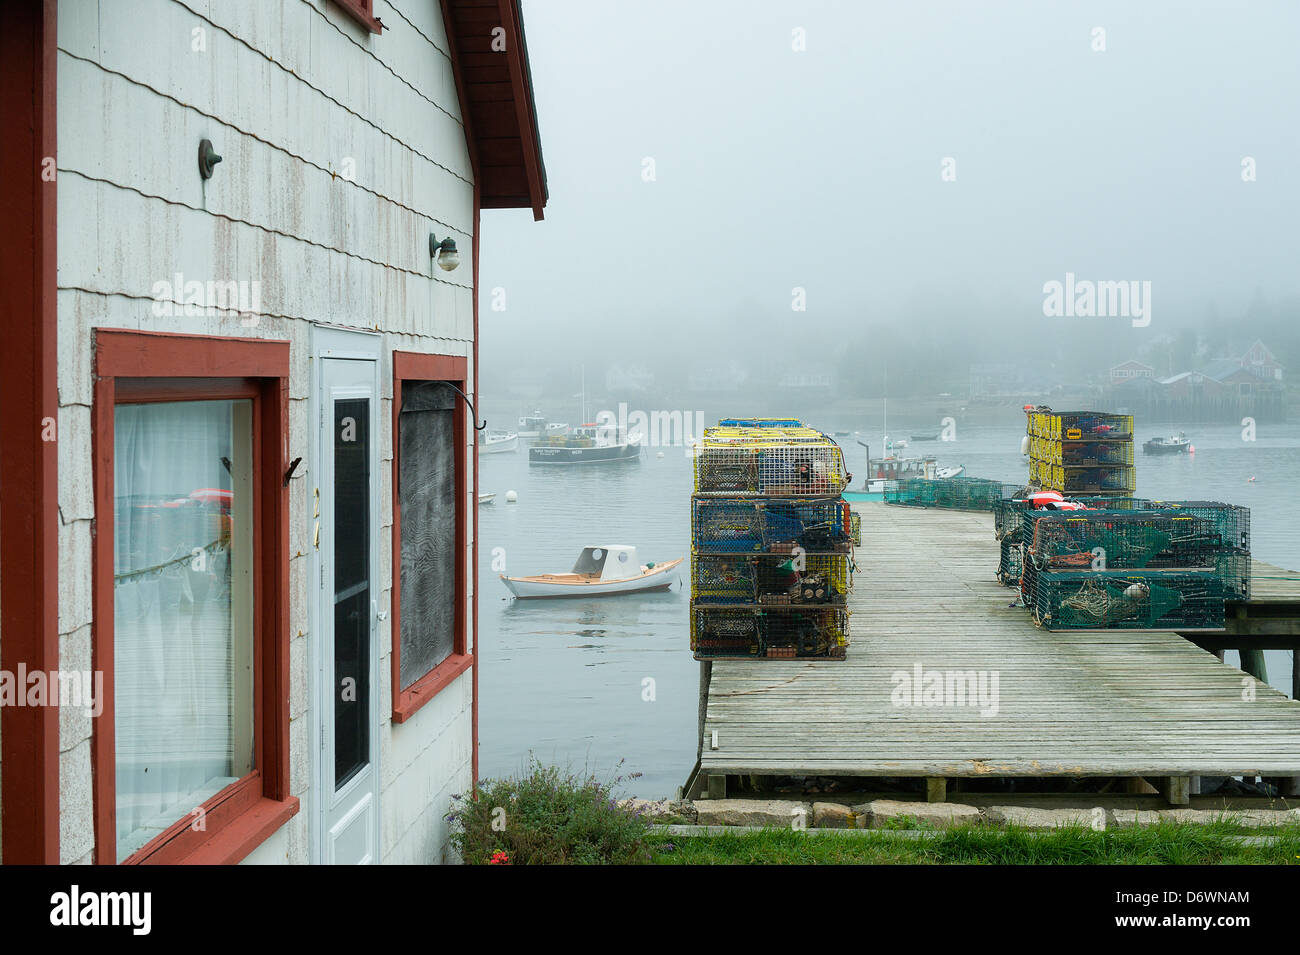 Fishing shack, Bernard, Mt Desert Island, Maine, USA - Stock Image